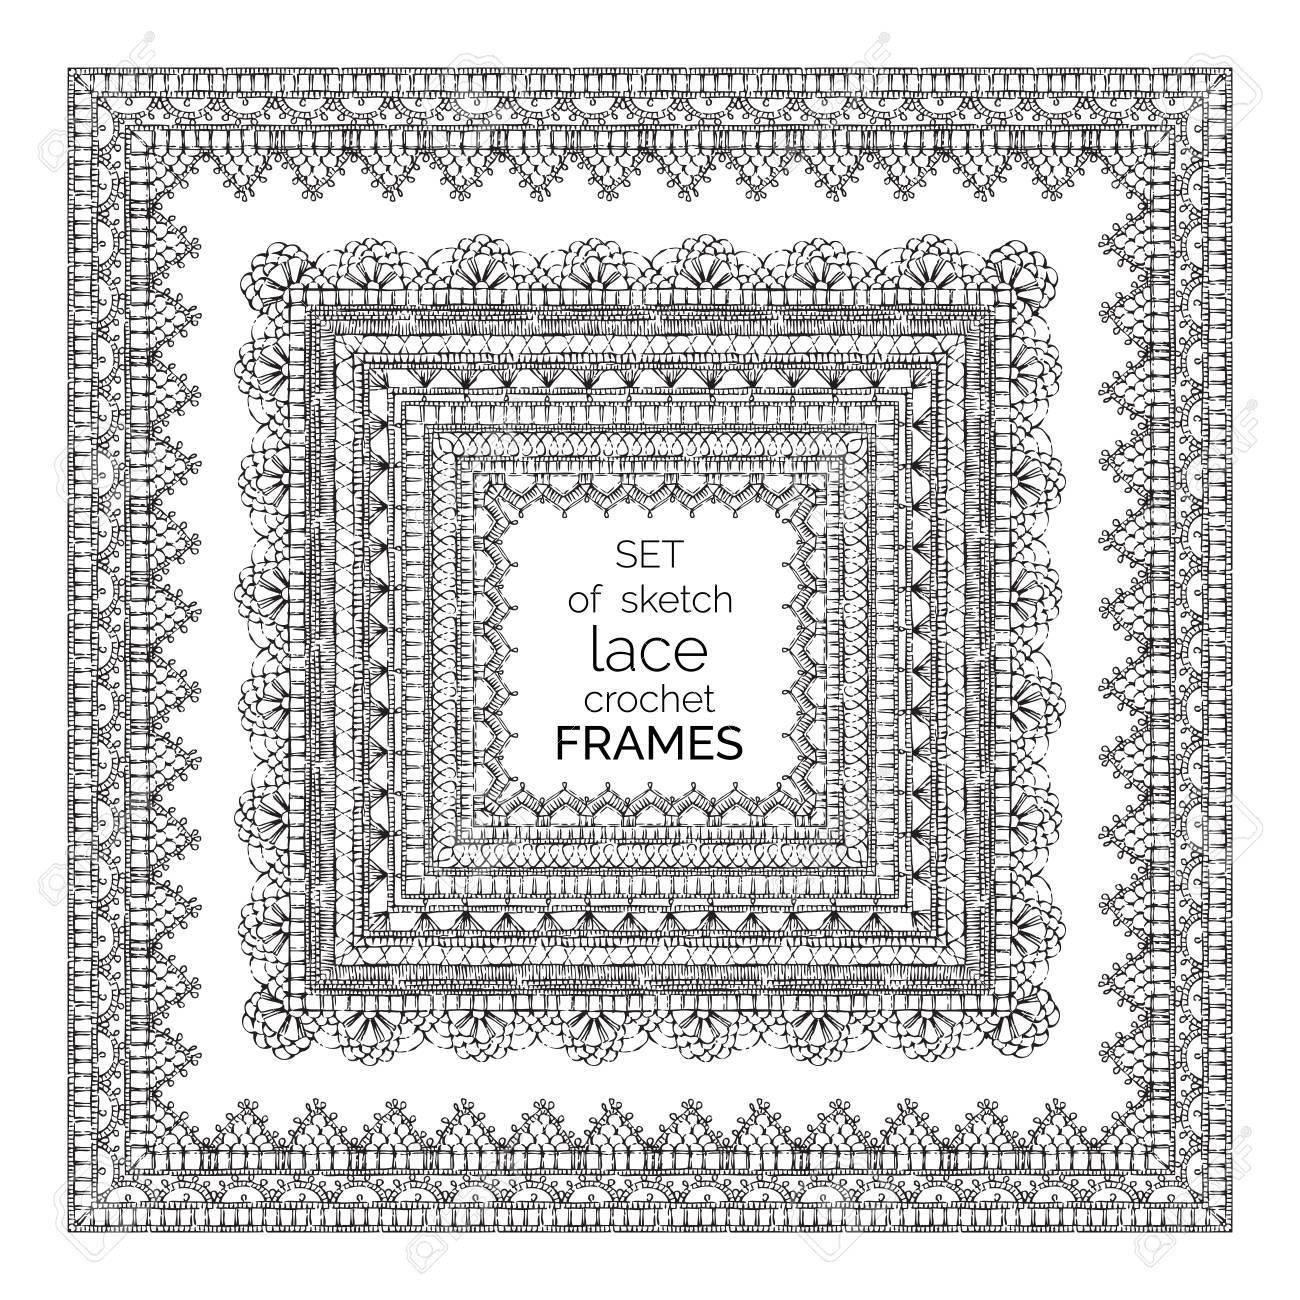 Vector Set Of Sketch Lace Crochet Square Frames. Ornate Crochet ...